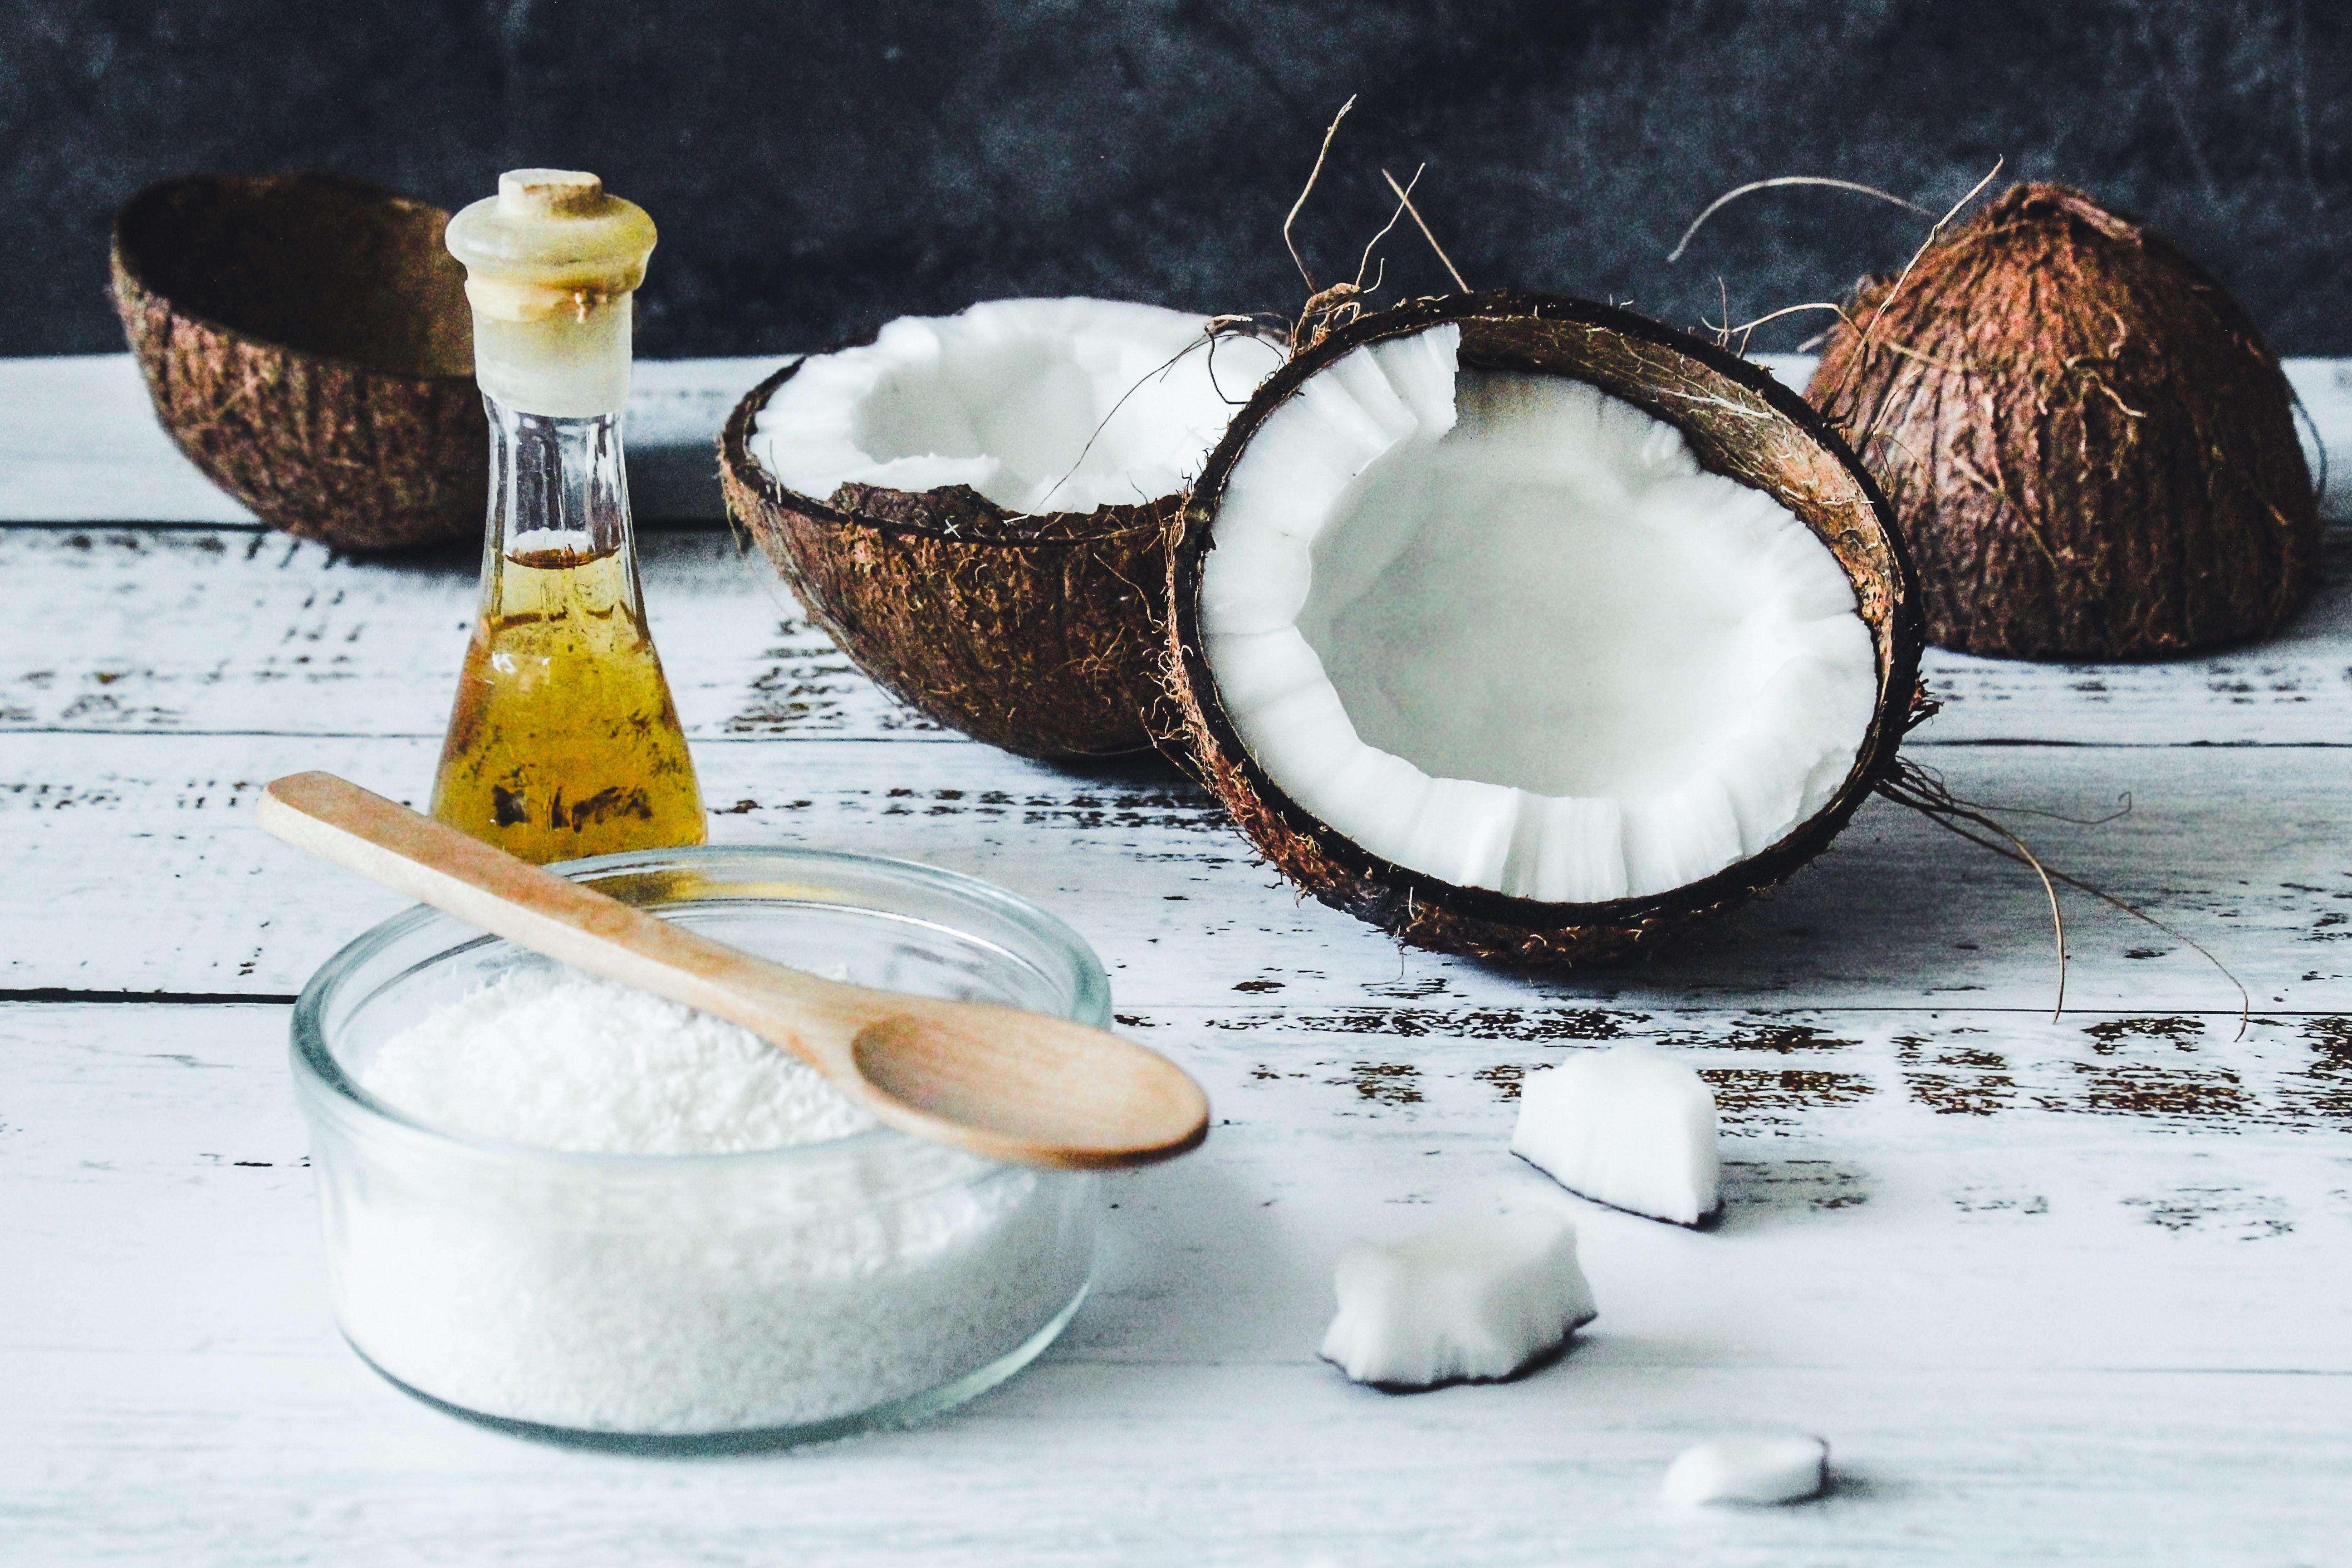 7 Surprising Health Benefits of Coconut Oil